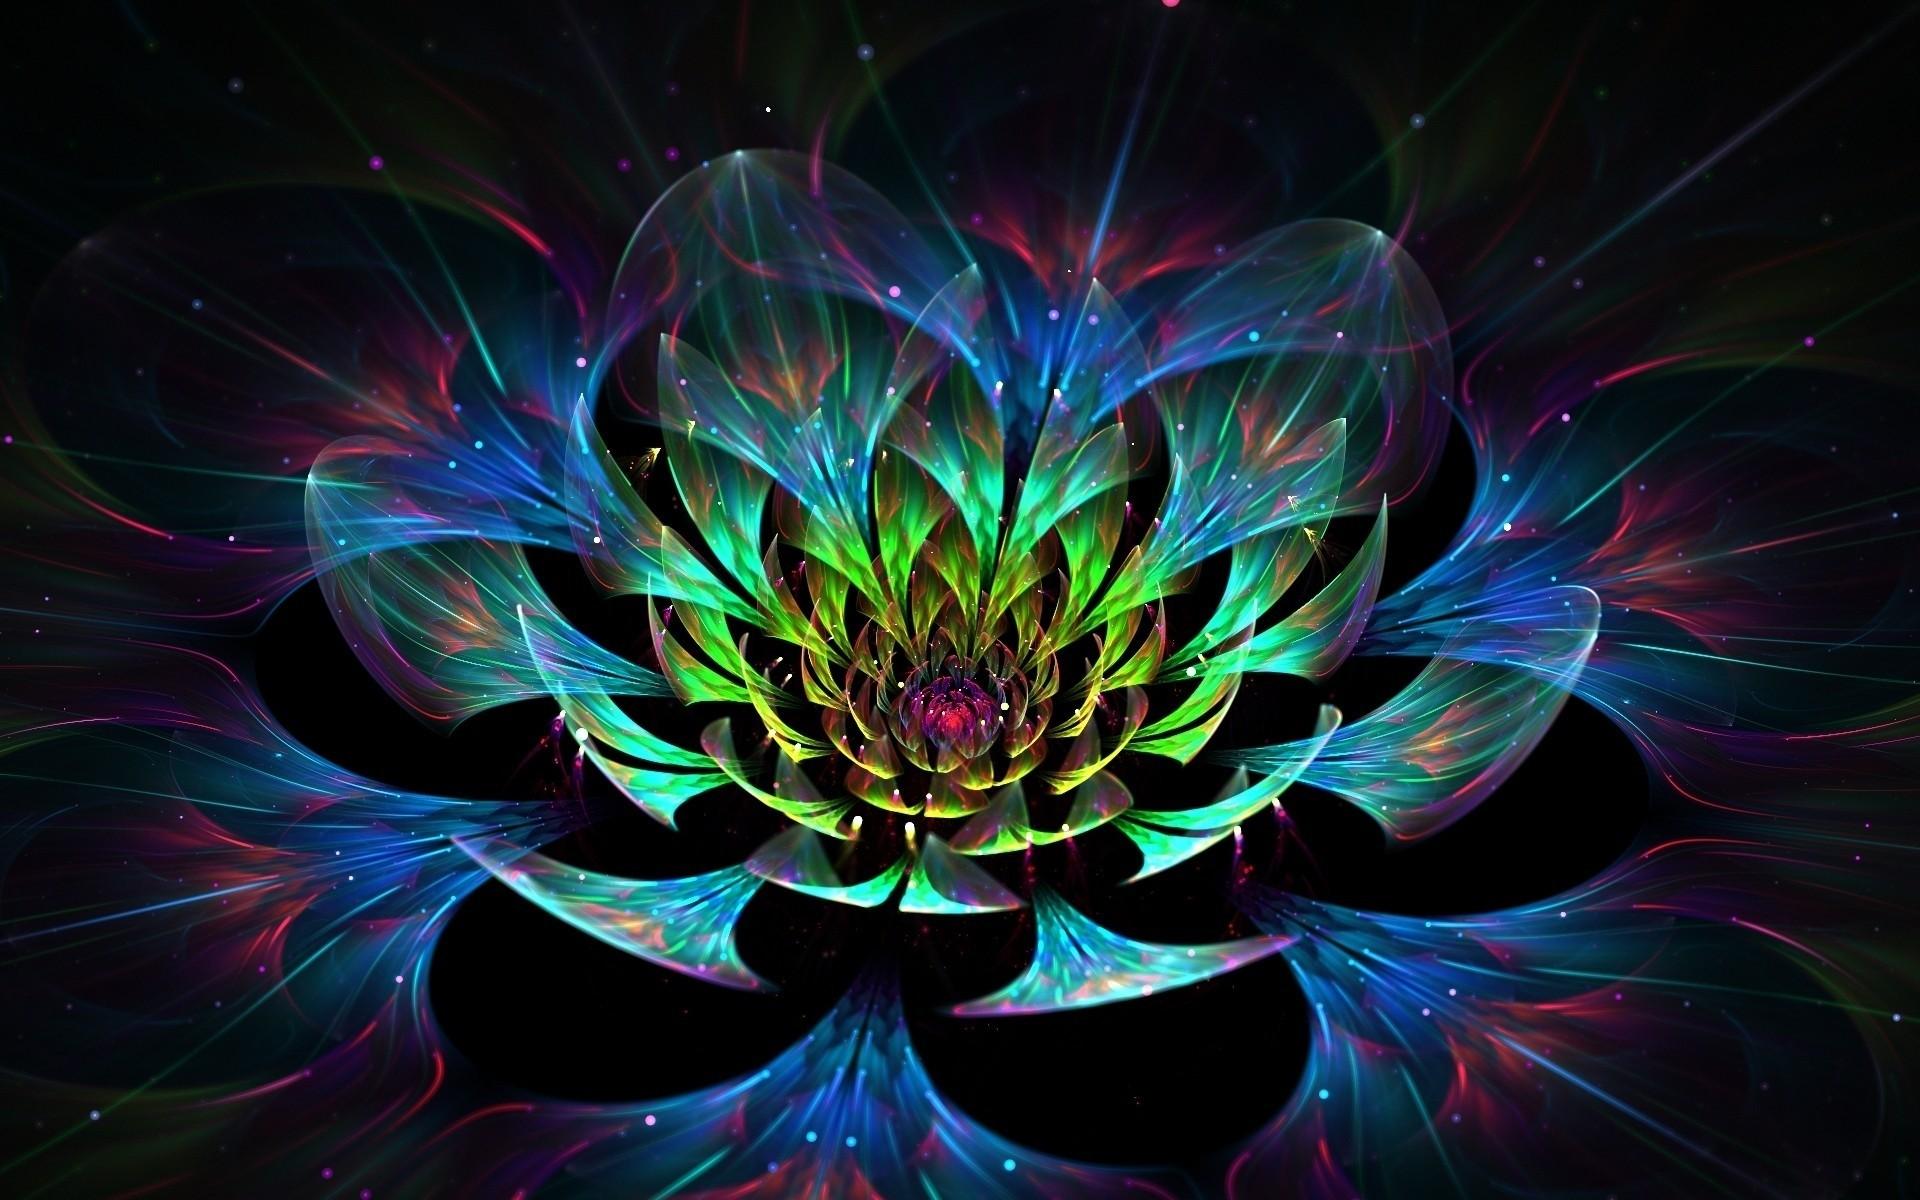 3d Lotus Flower Desktop Wallpapers For Free